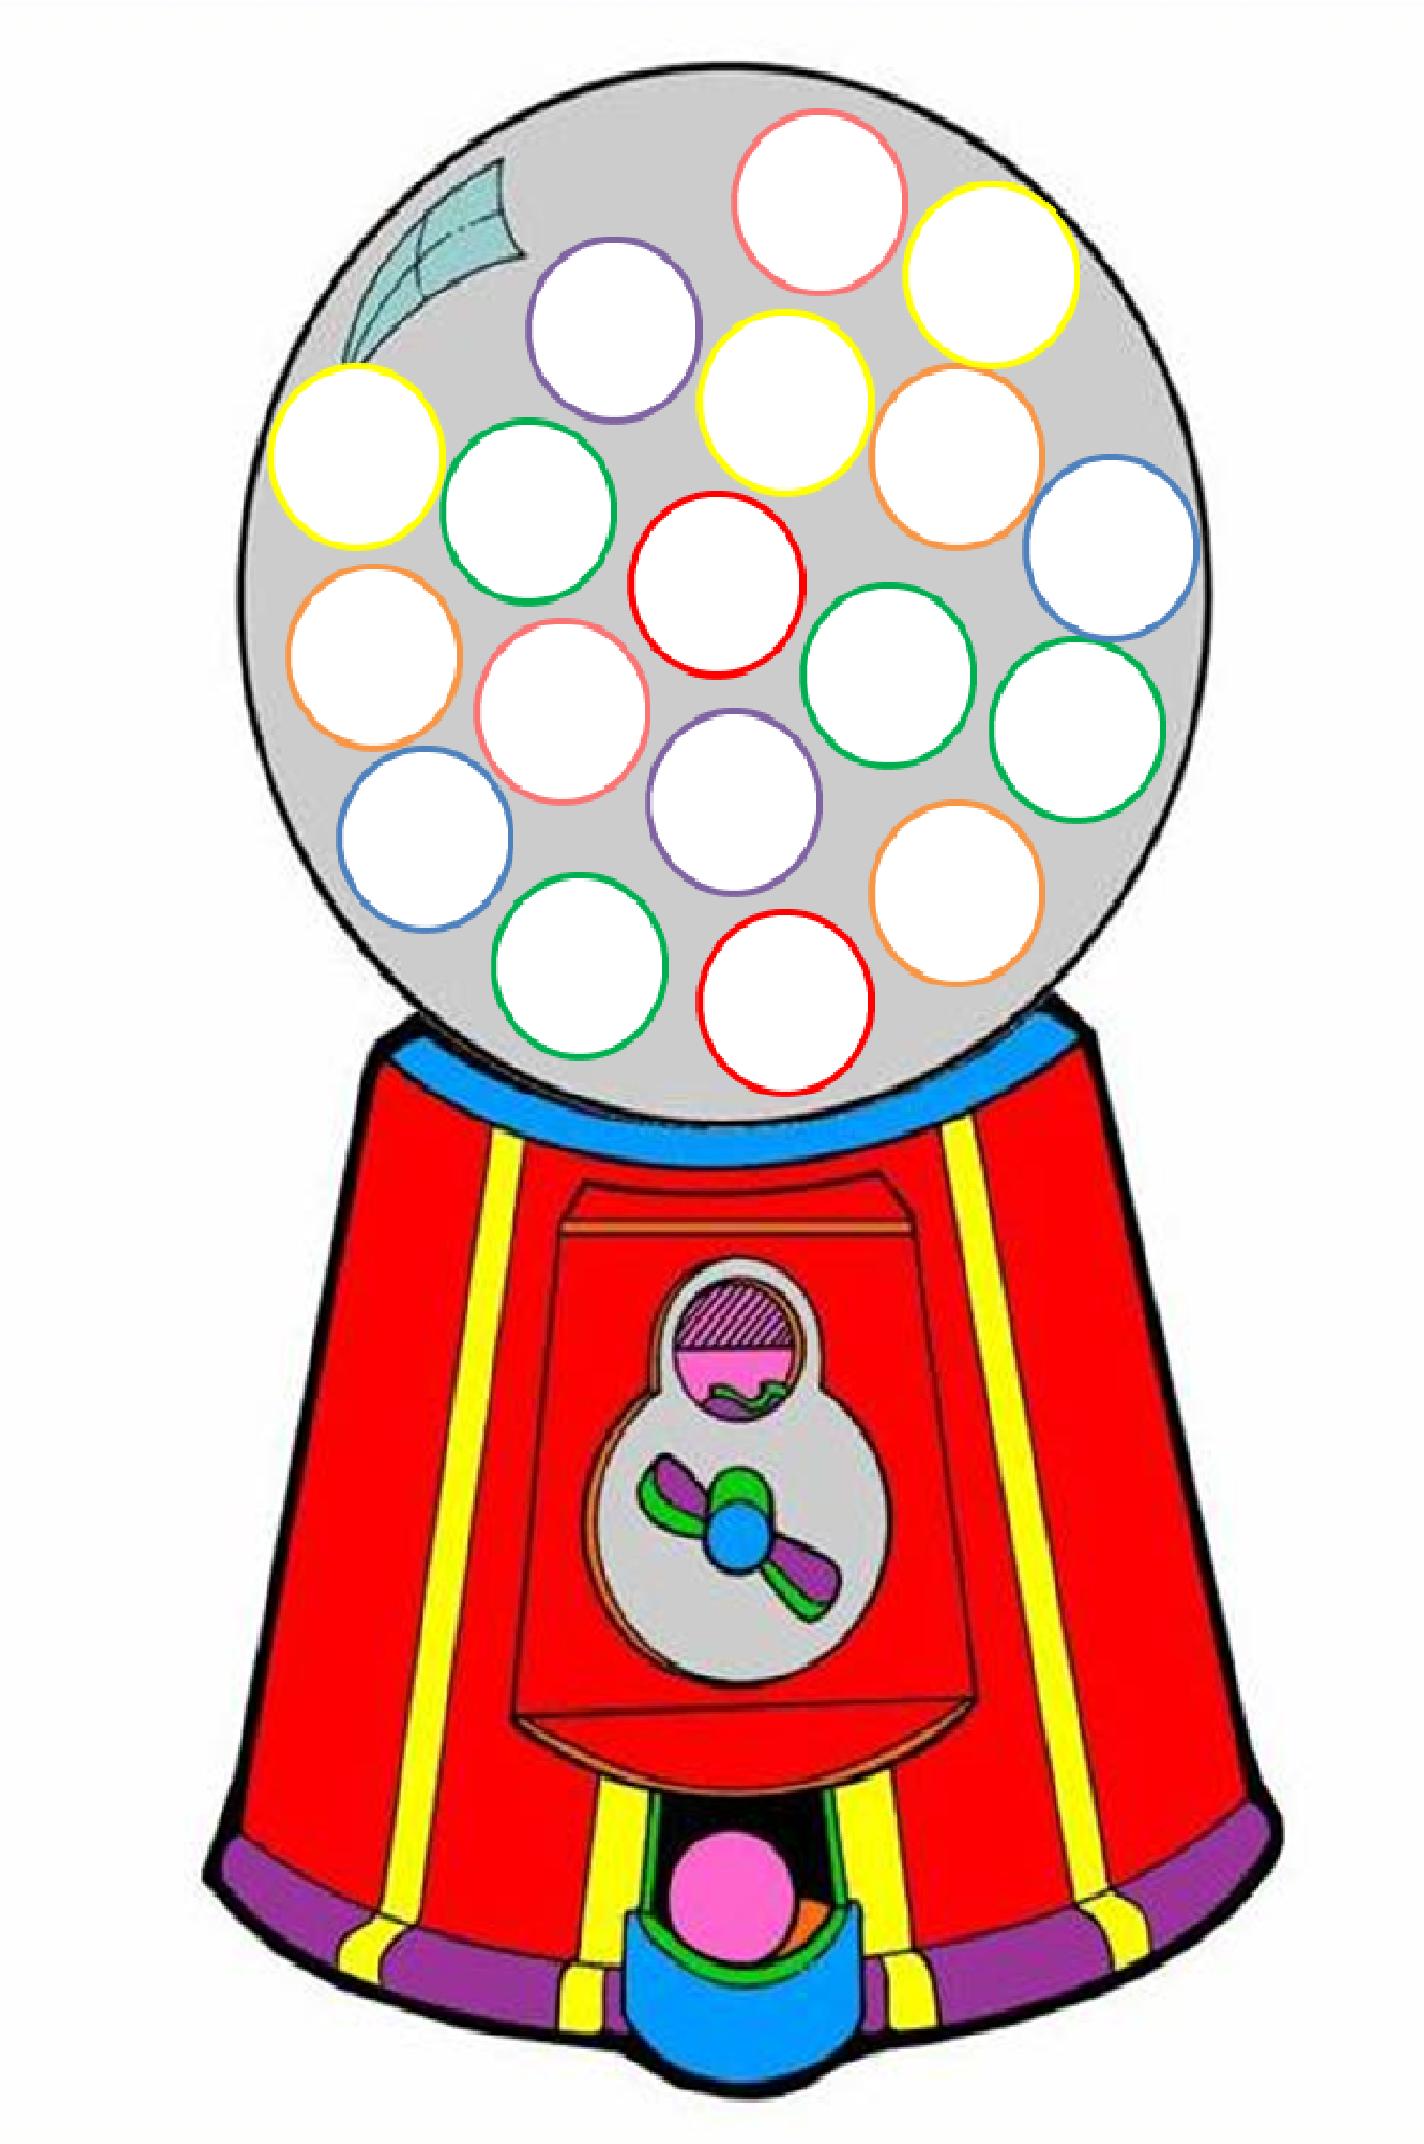 Chewing Gum clipart machine Clipart Art Machine Clipart Gumball